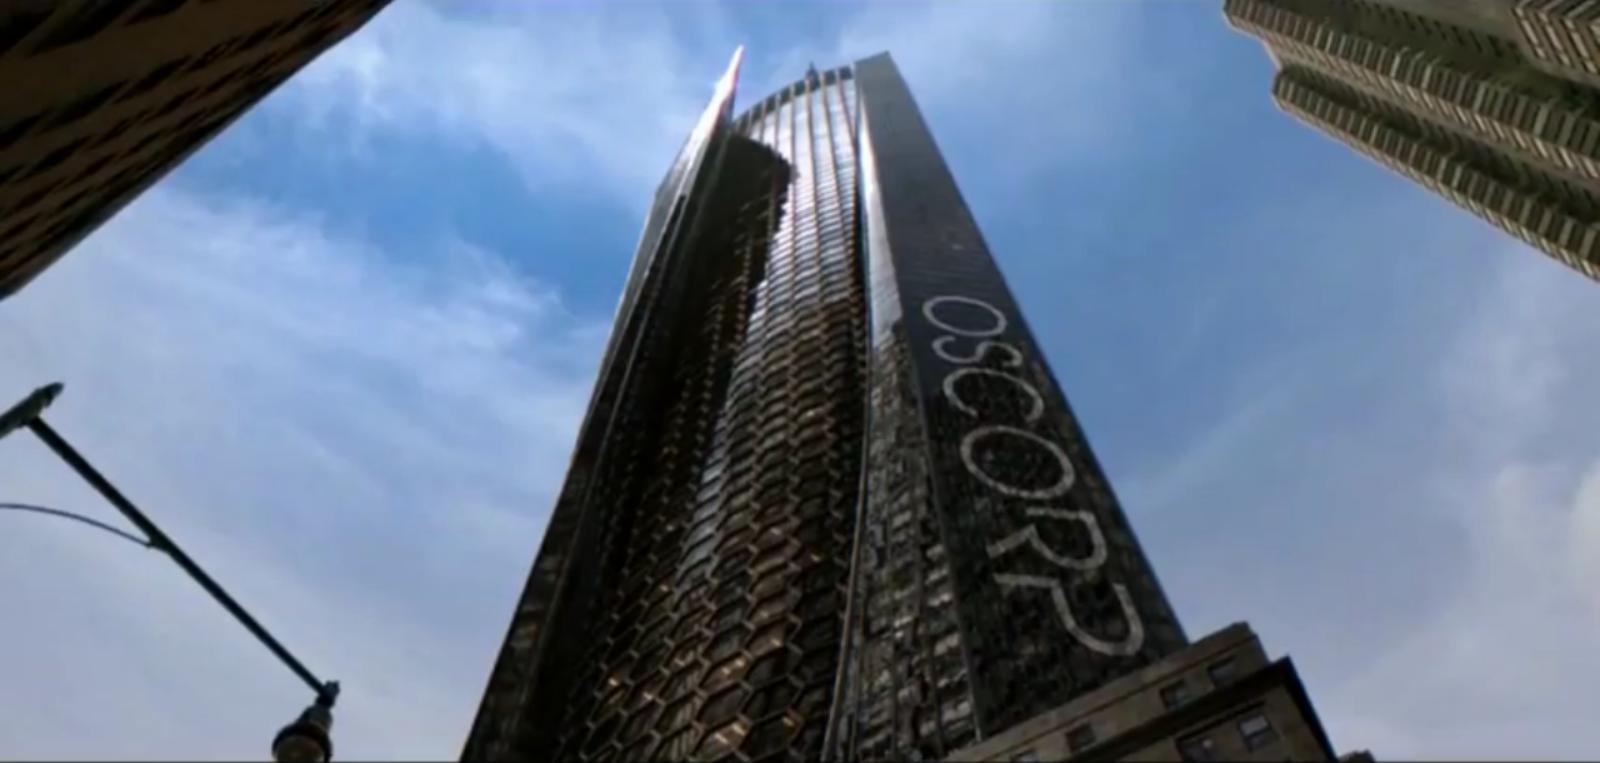 The Hadal Current [Dusk/Zenaki] Oscorp_Tower